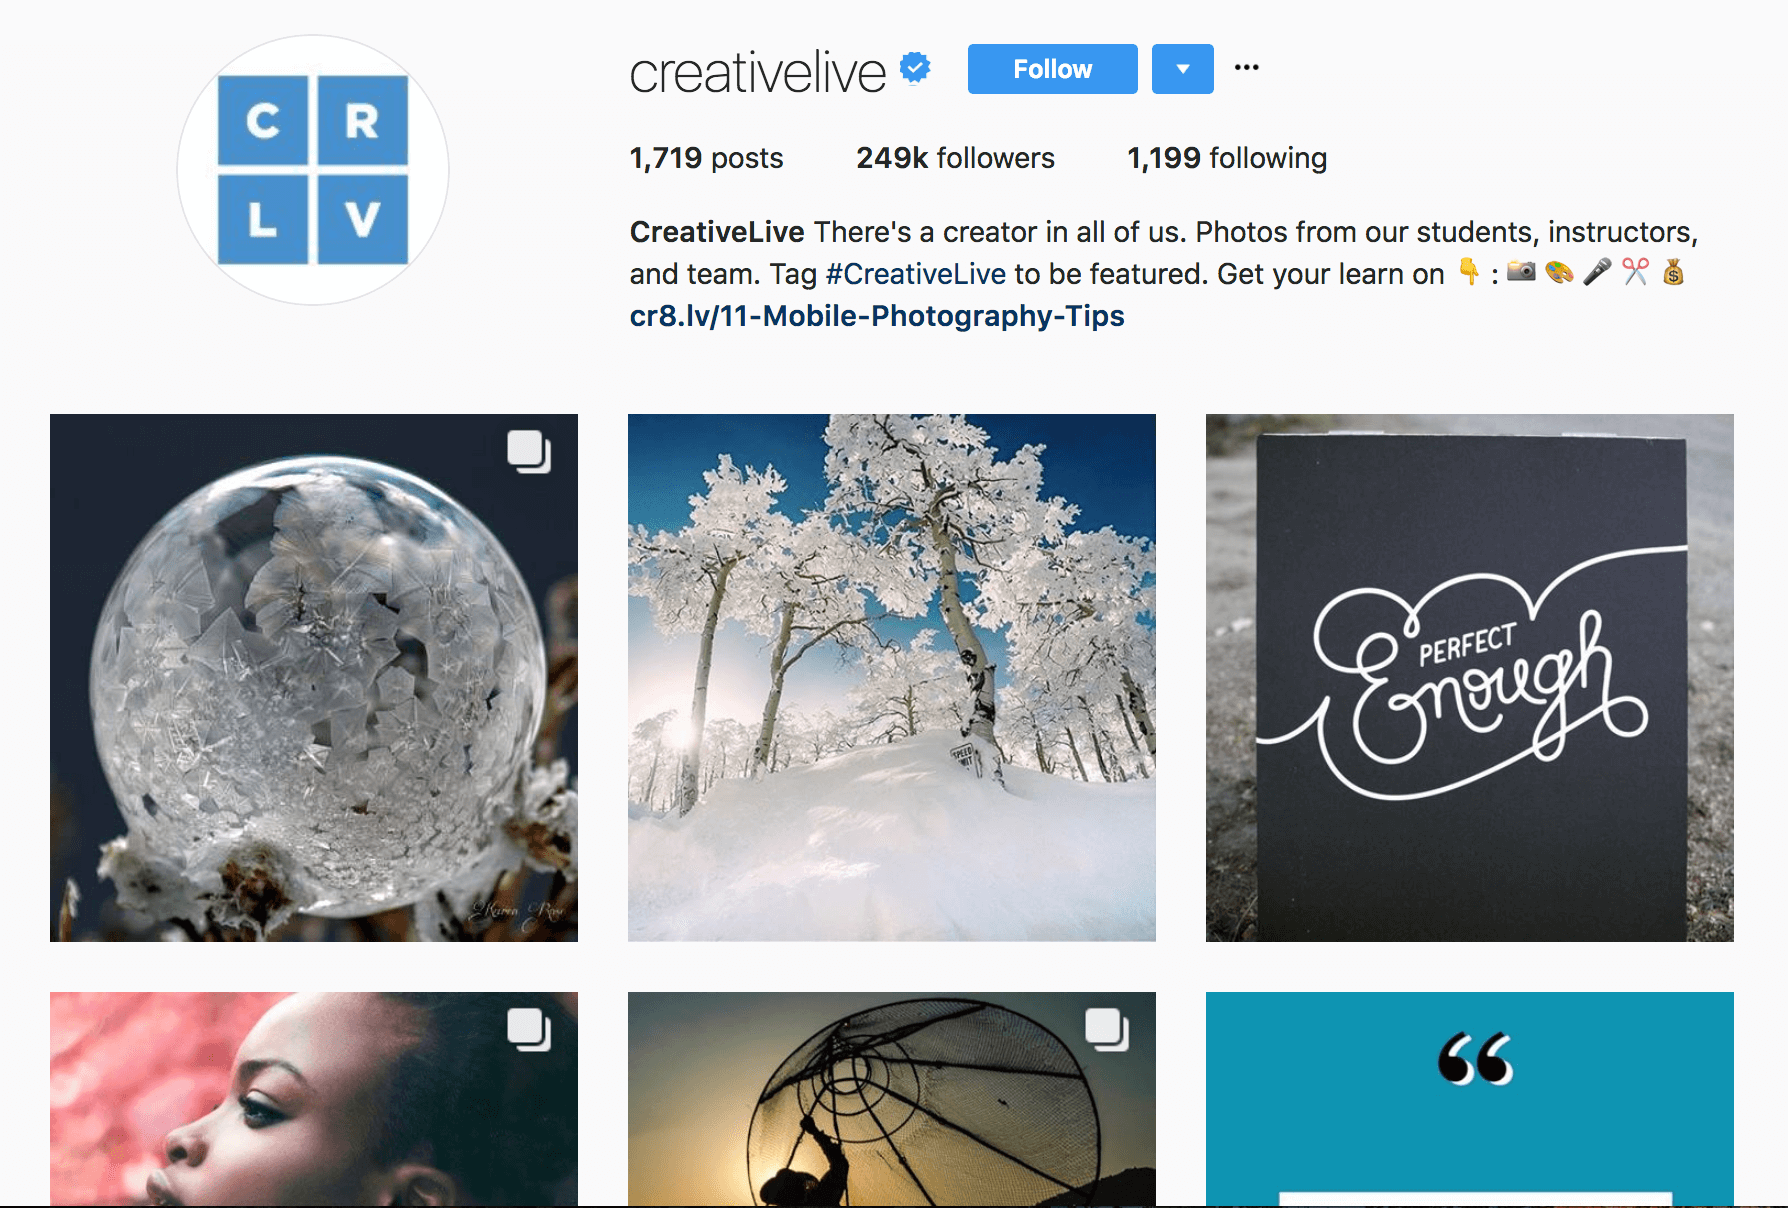 creativelive instagram.png